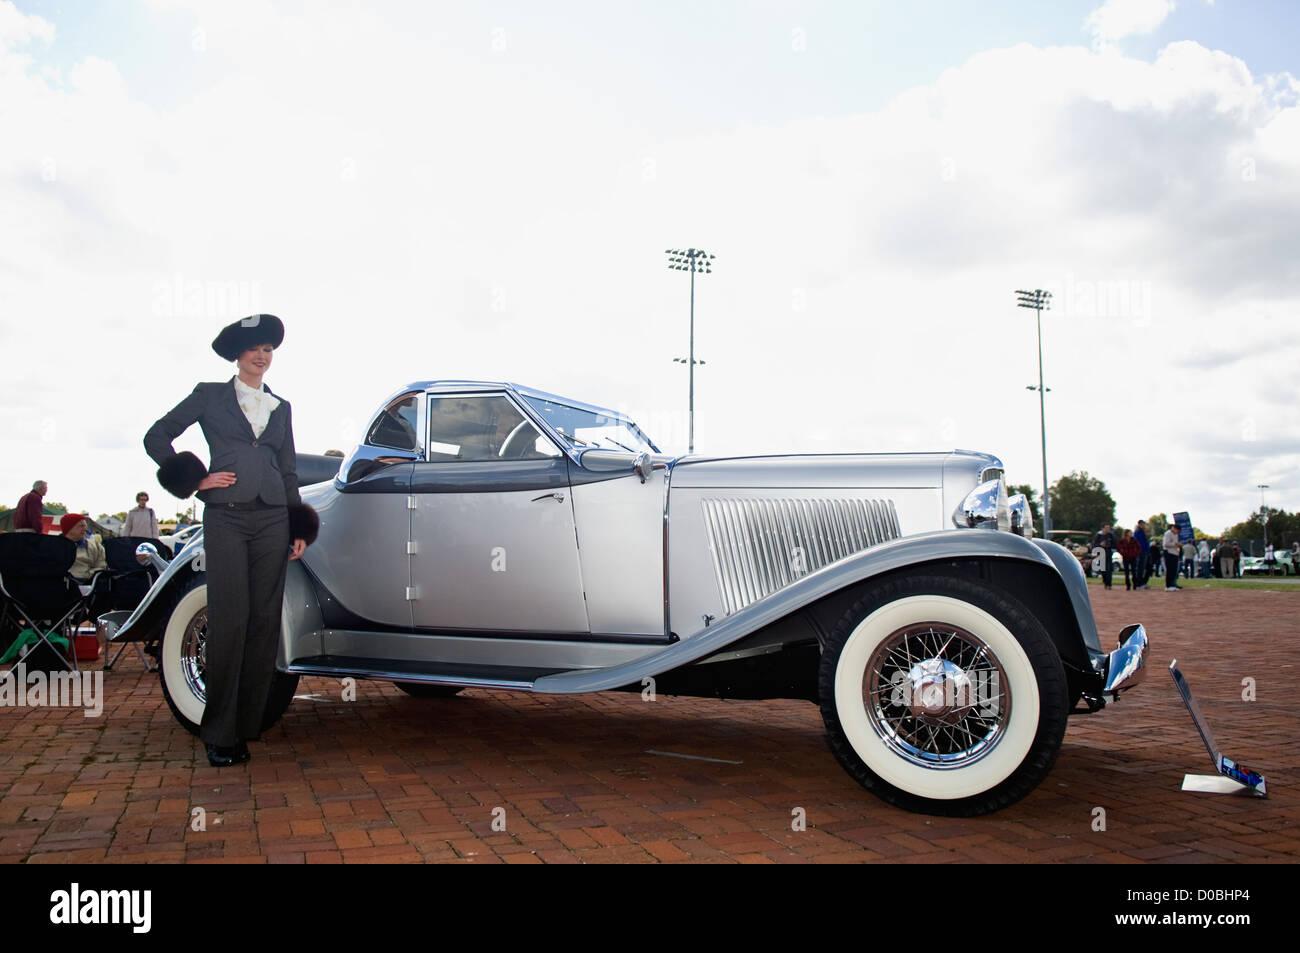 Modelo posando junto a clásicos de Auburn Automobile 2012 en el Concours d'Elegance de Churchill Downs Imagen De Stock